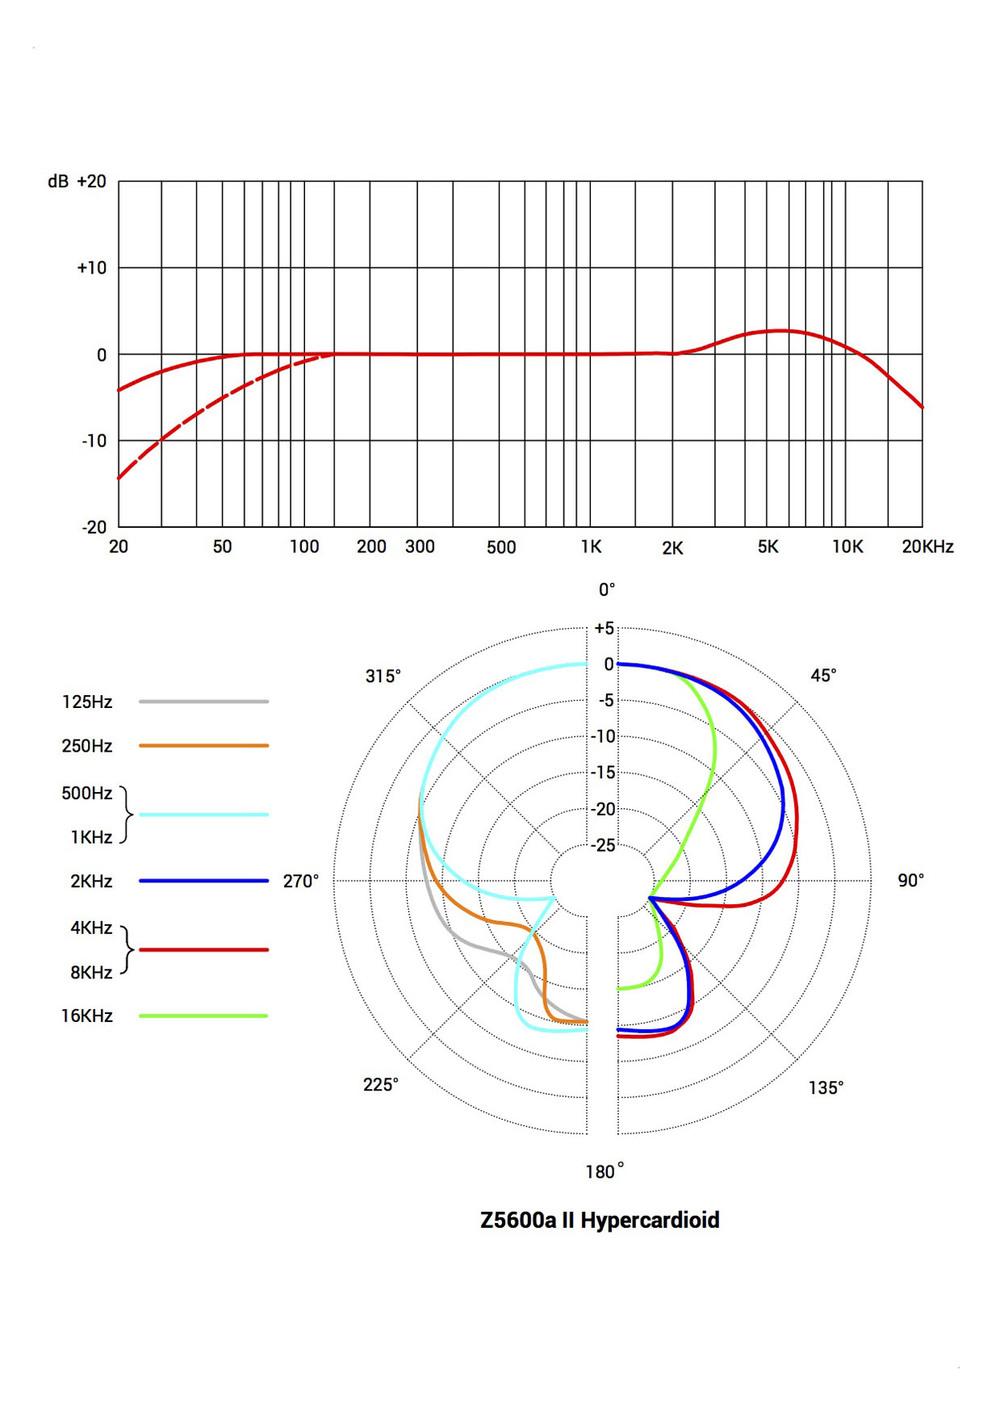 Z5600a II Hypercardioid.jpg